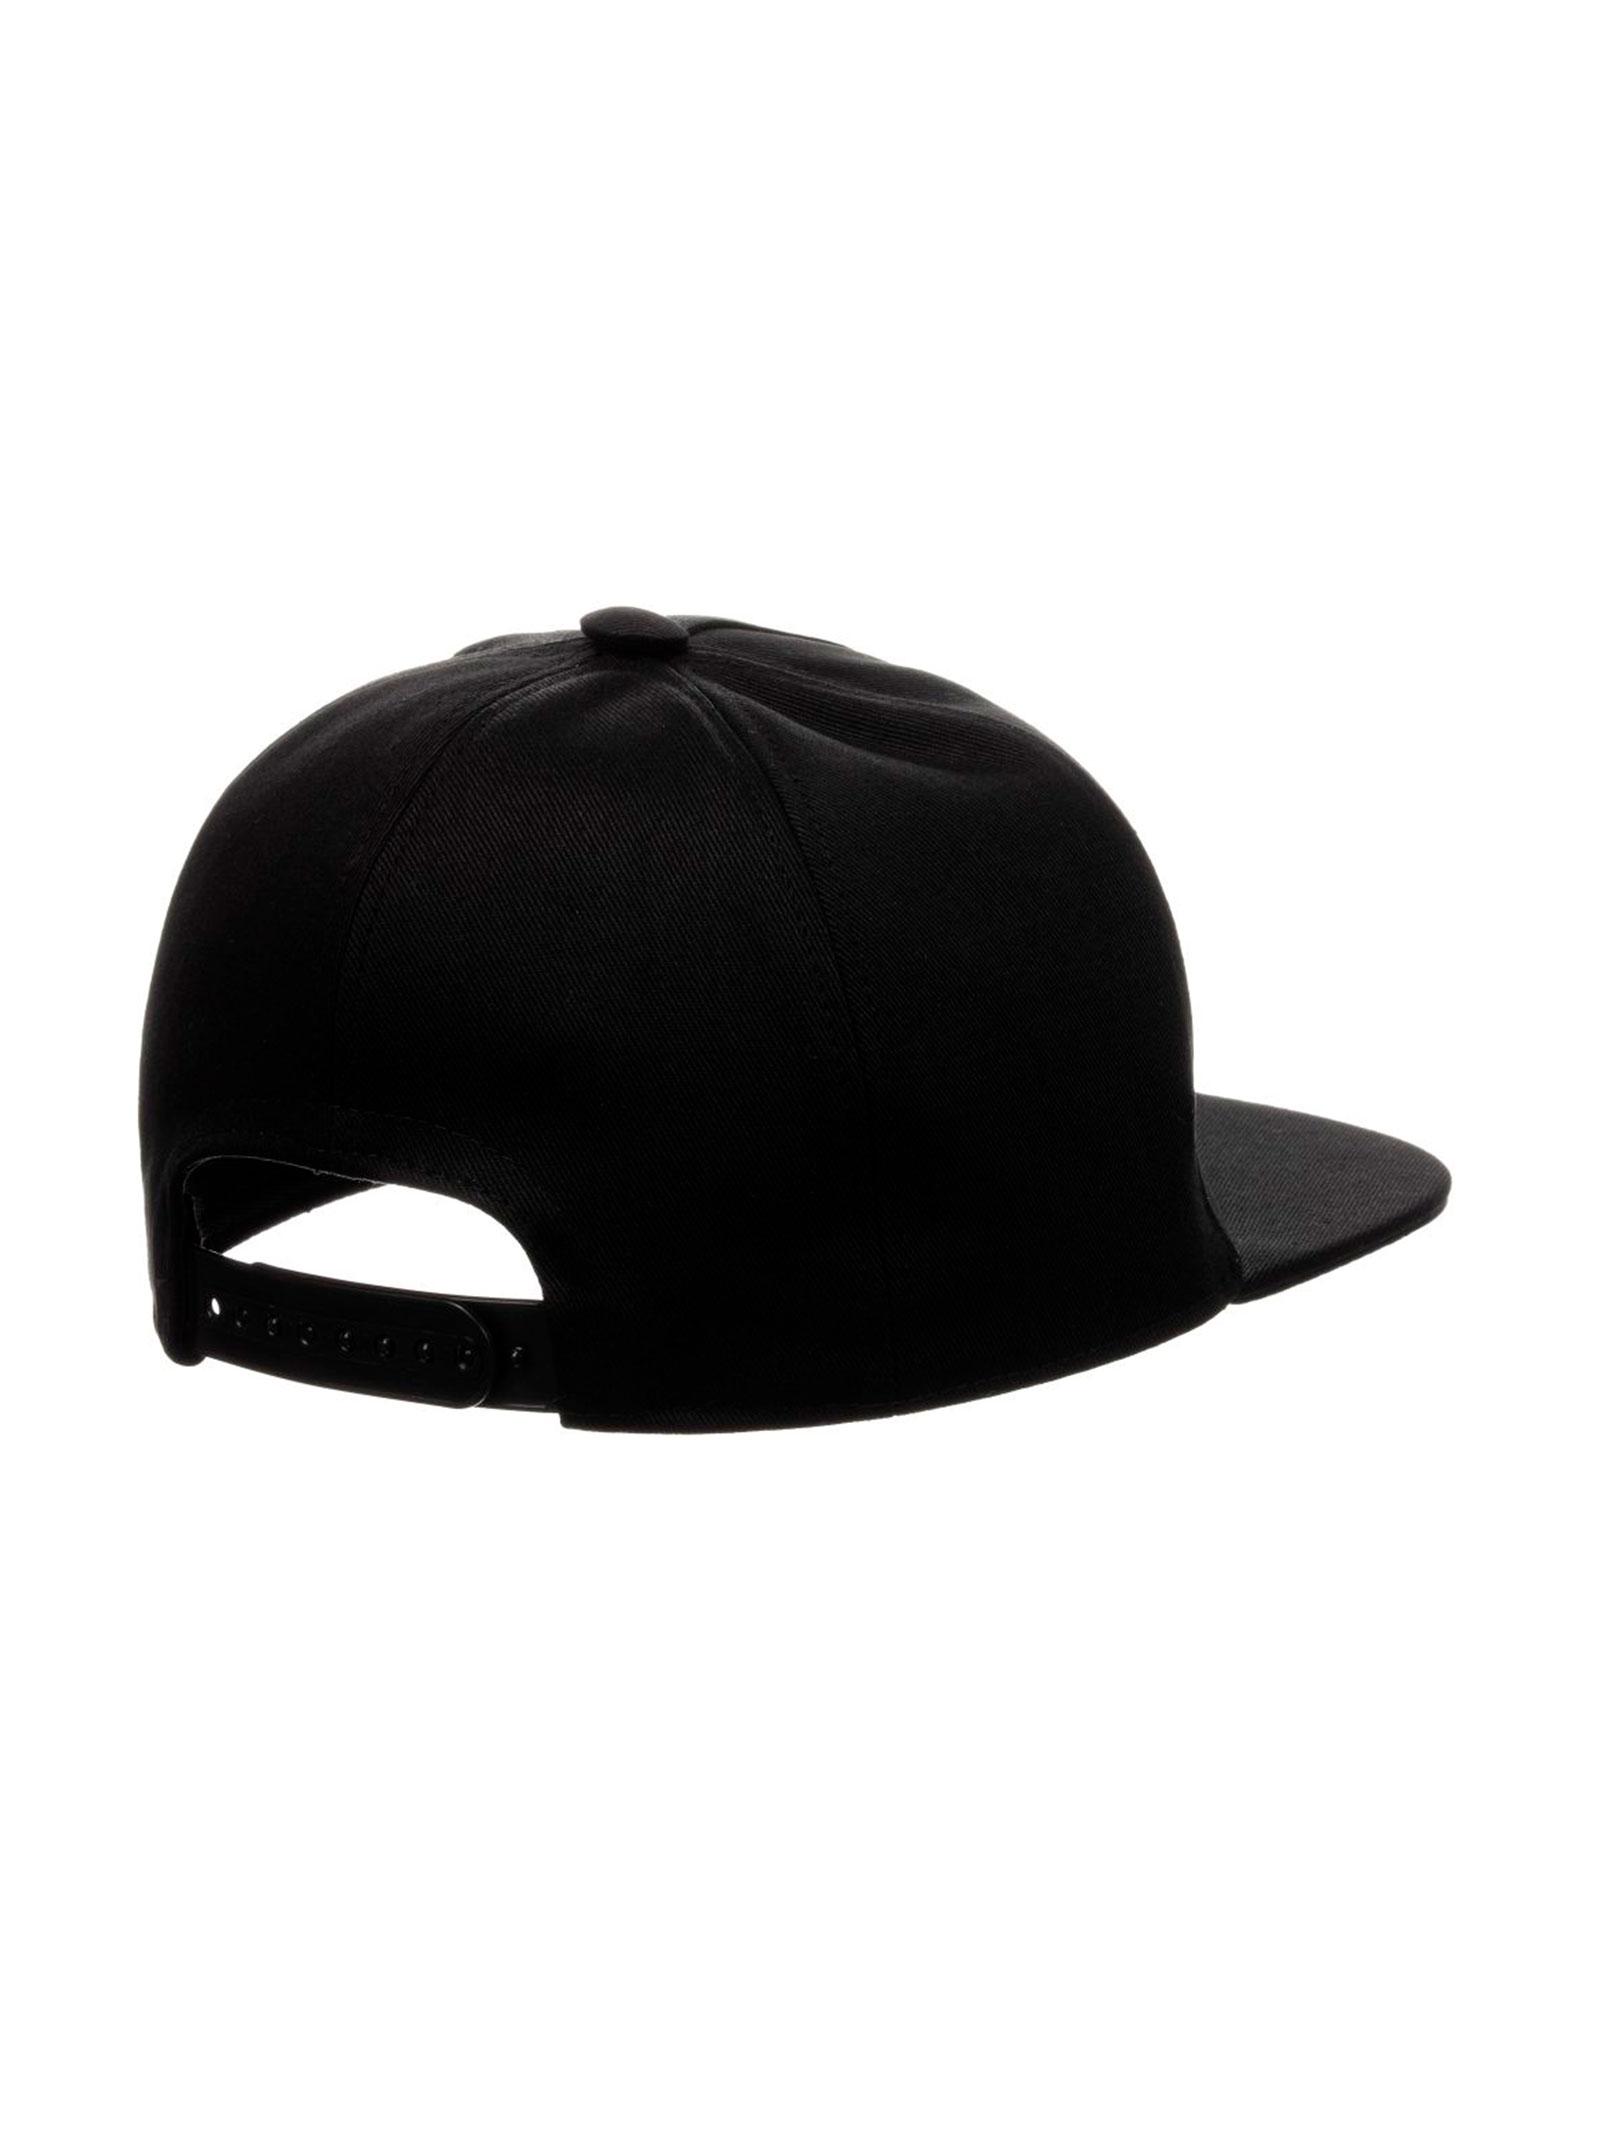 BLACK HAT GIVENCHY KIDS FOR BOY - Givenchy Kids - Mancini Junior cb5f2b6f038